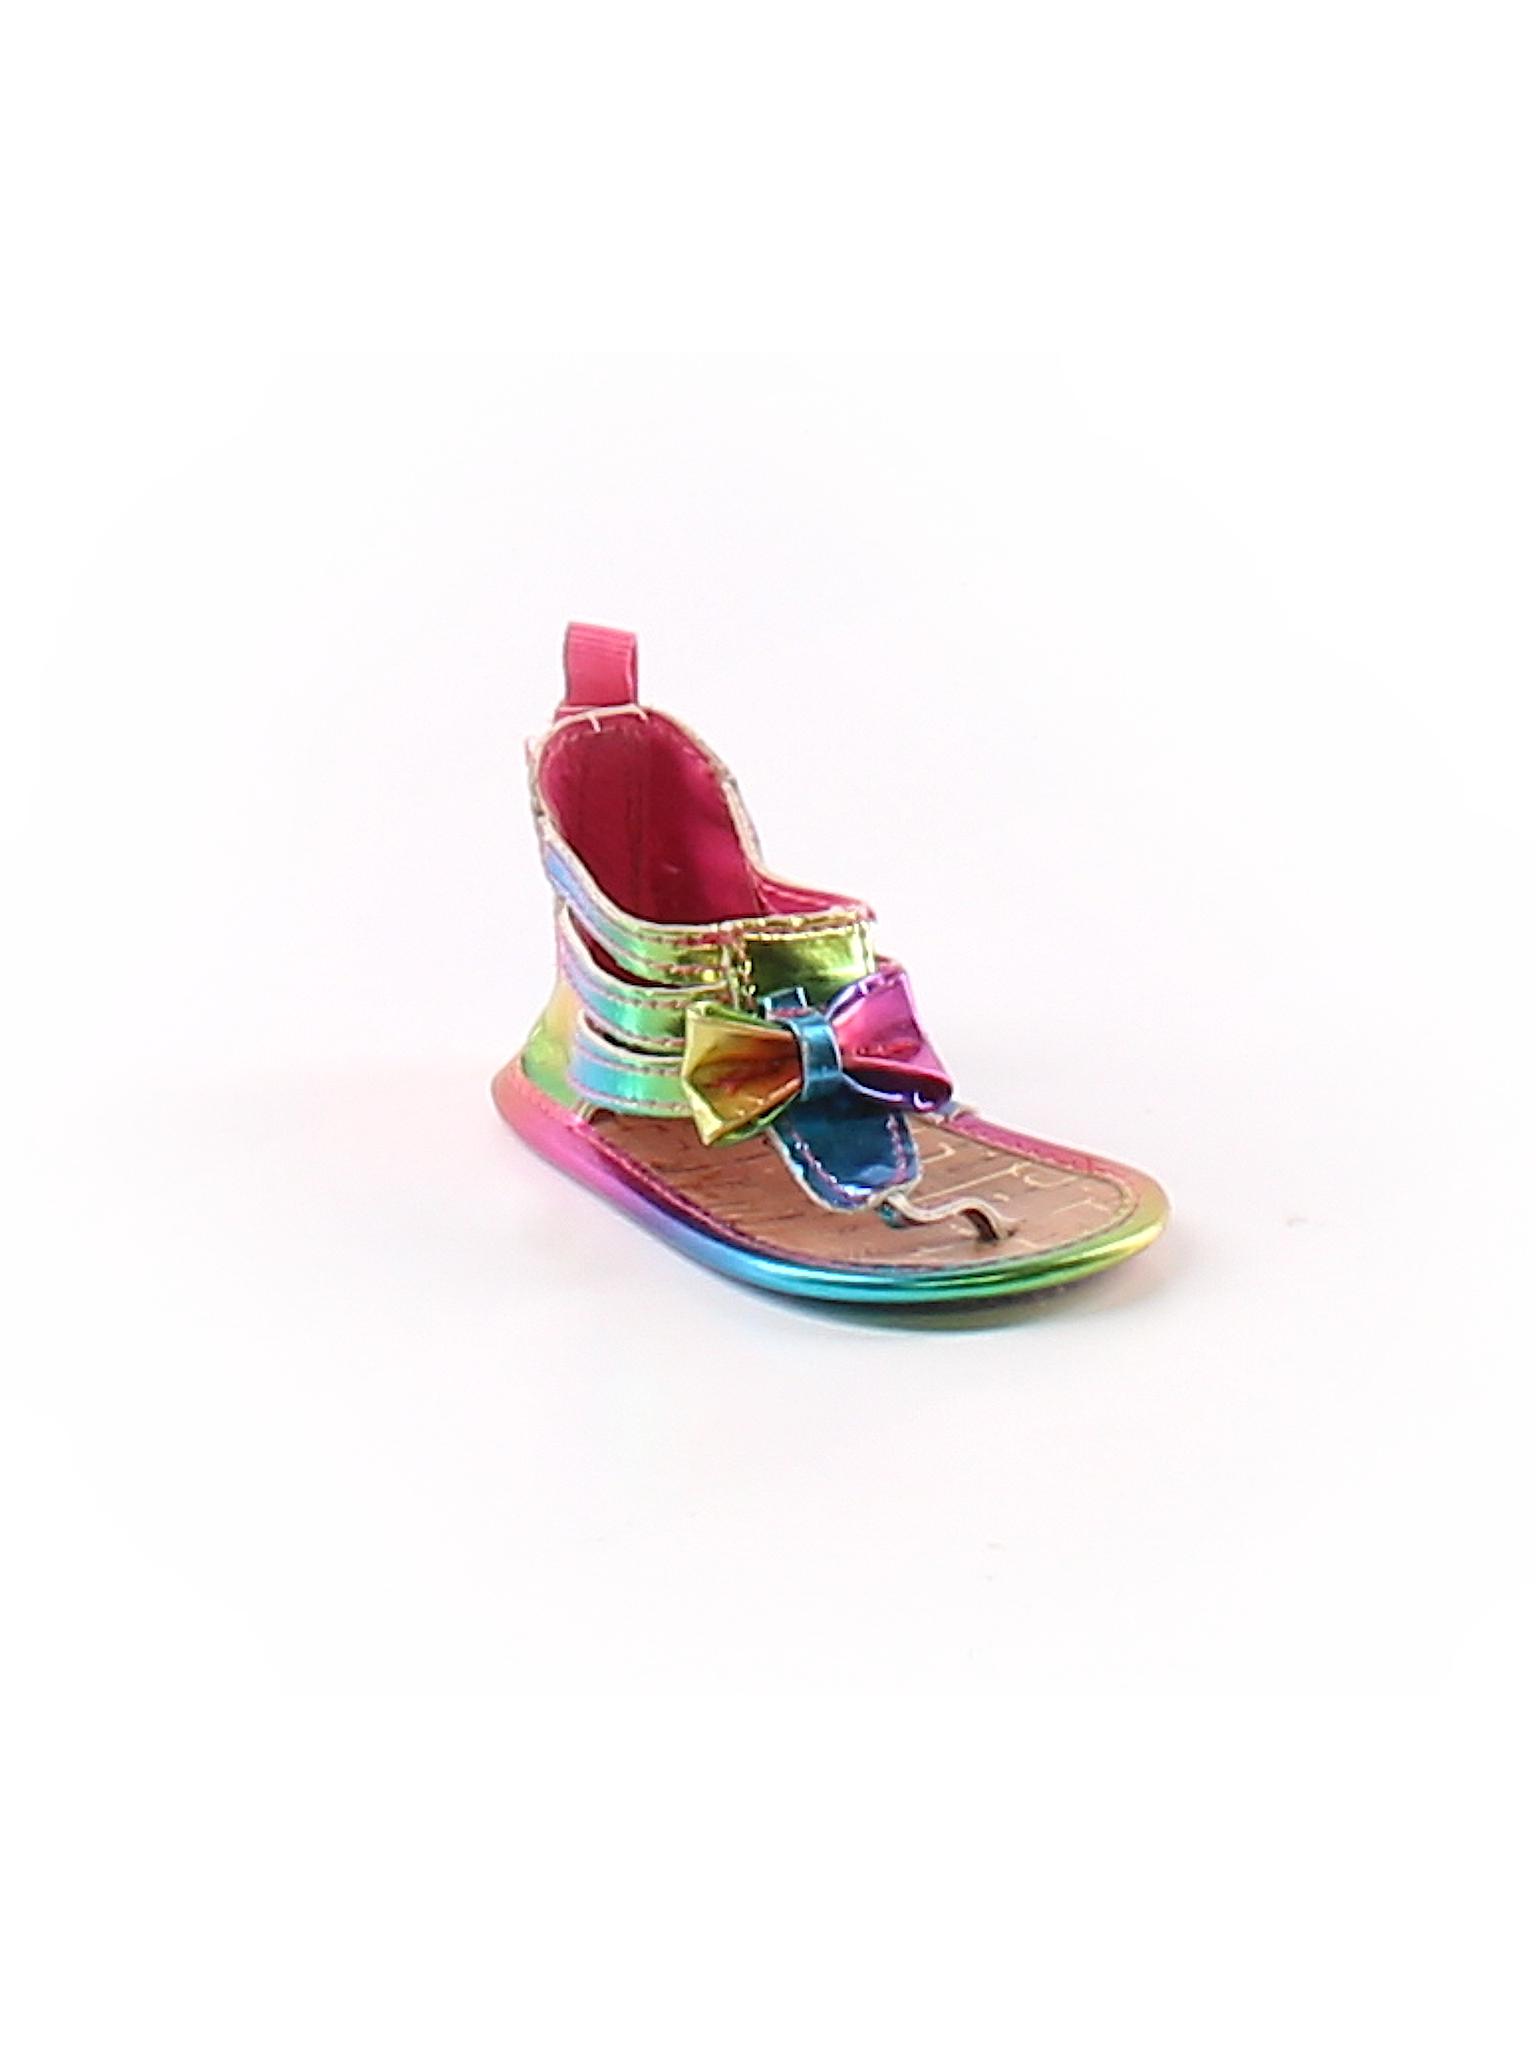 498f35bd5 Amy Coe Metallic Color Block Pink Sandals Size 2 - 77% off | thredUP